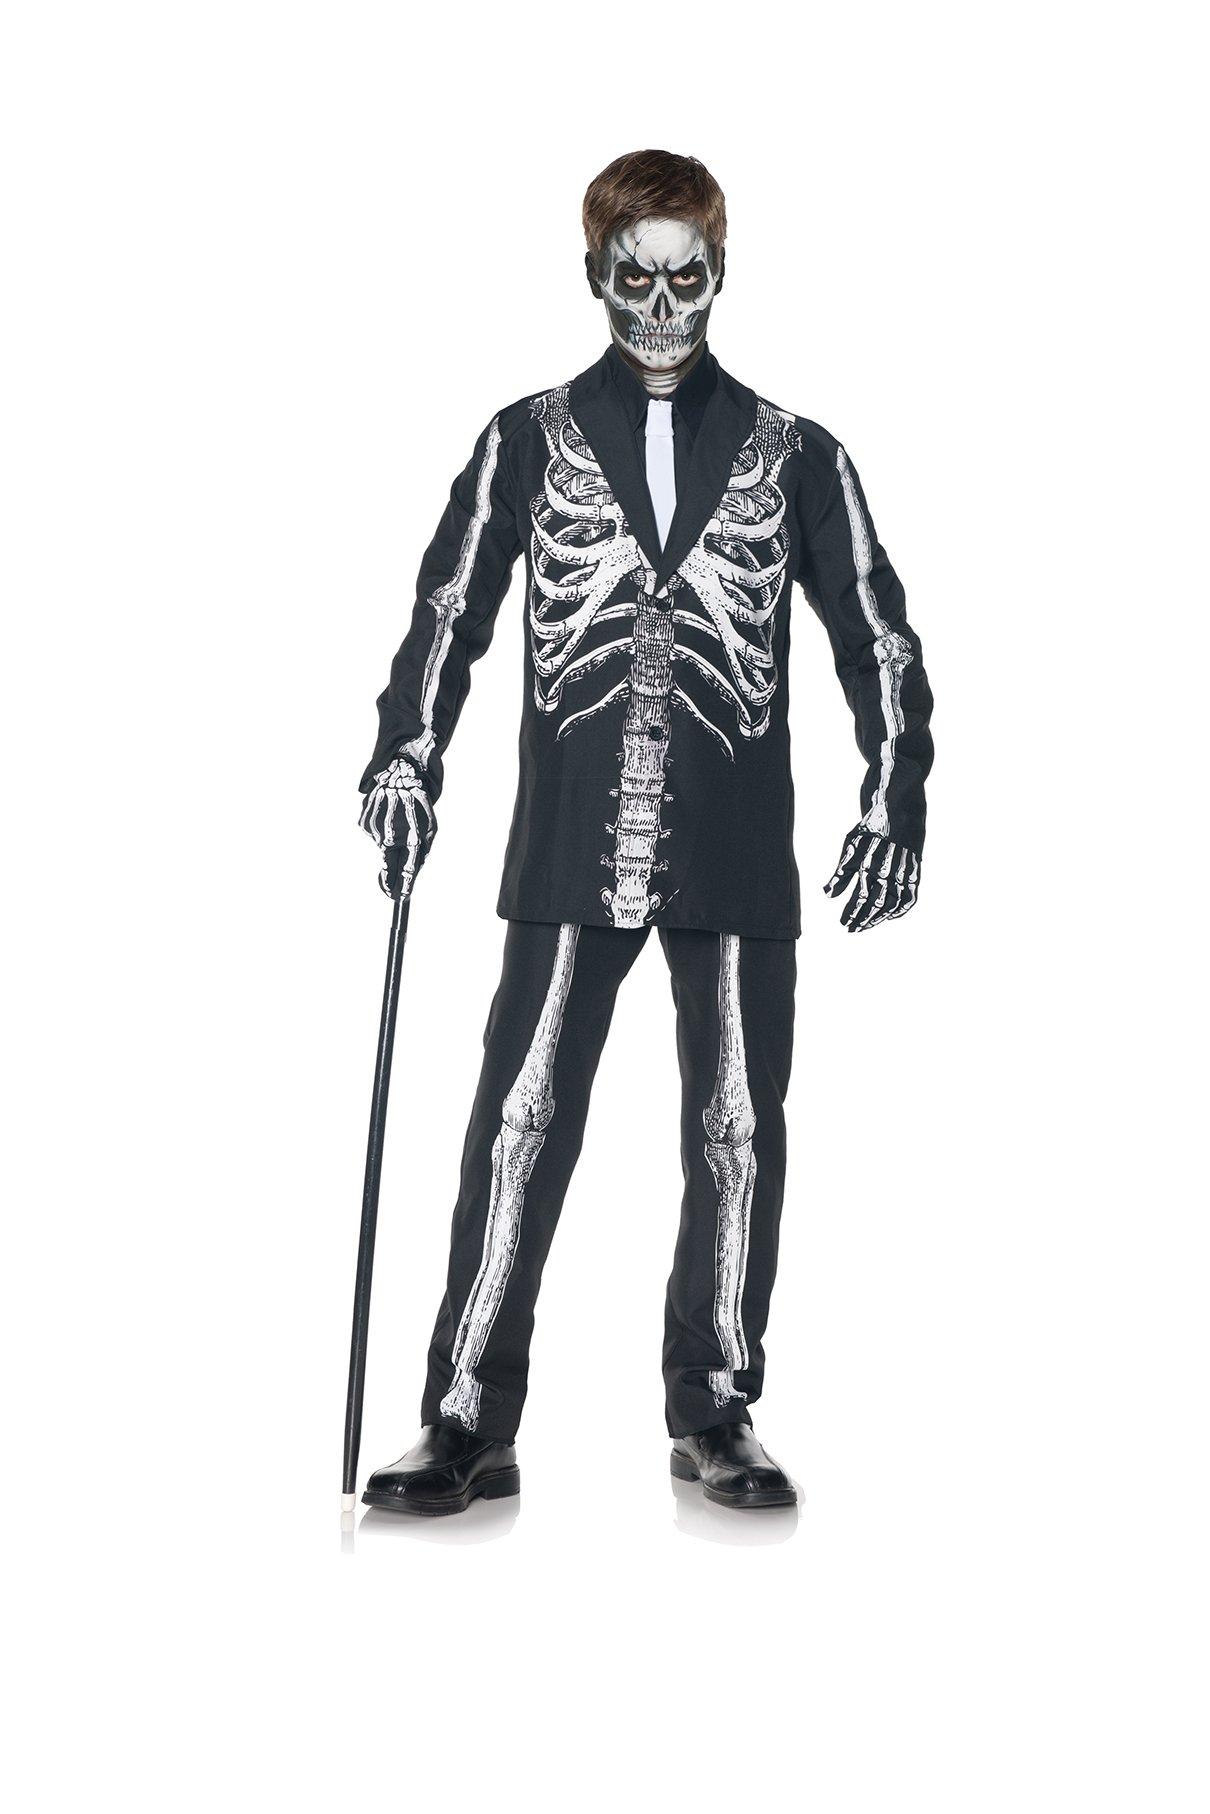 Underwraps Little Boy's Skeleton Suit Costume by Underwraps (Image #1)